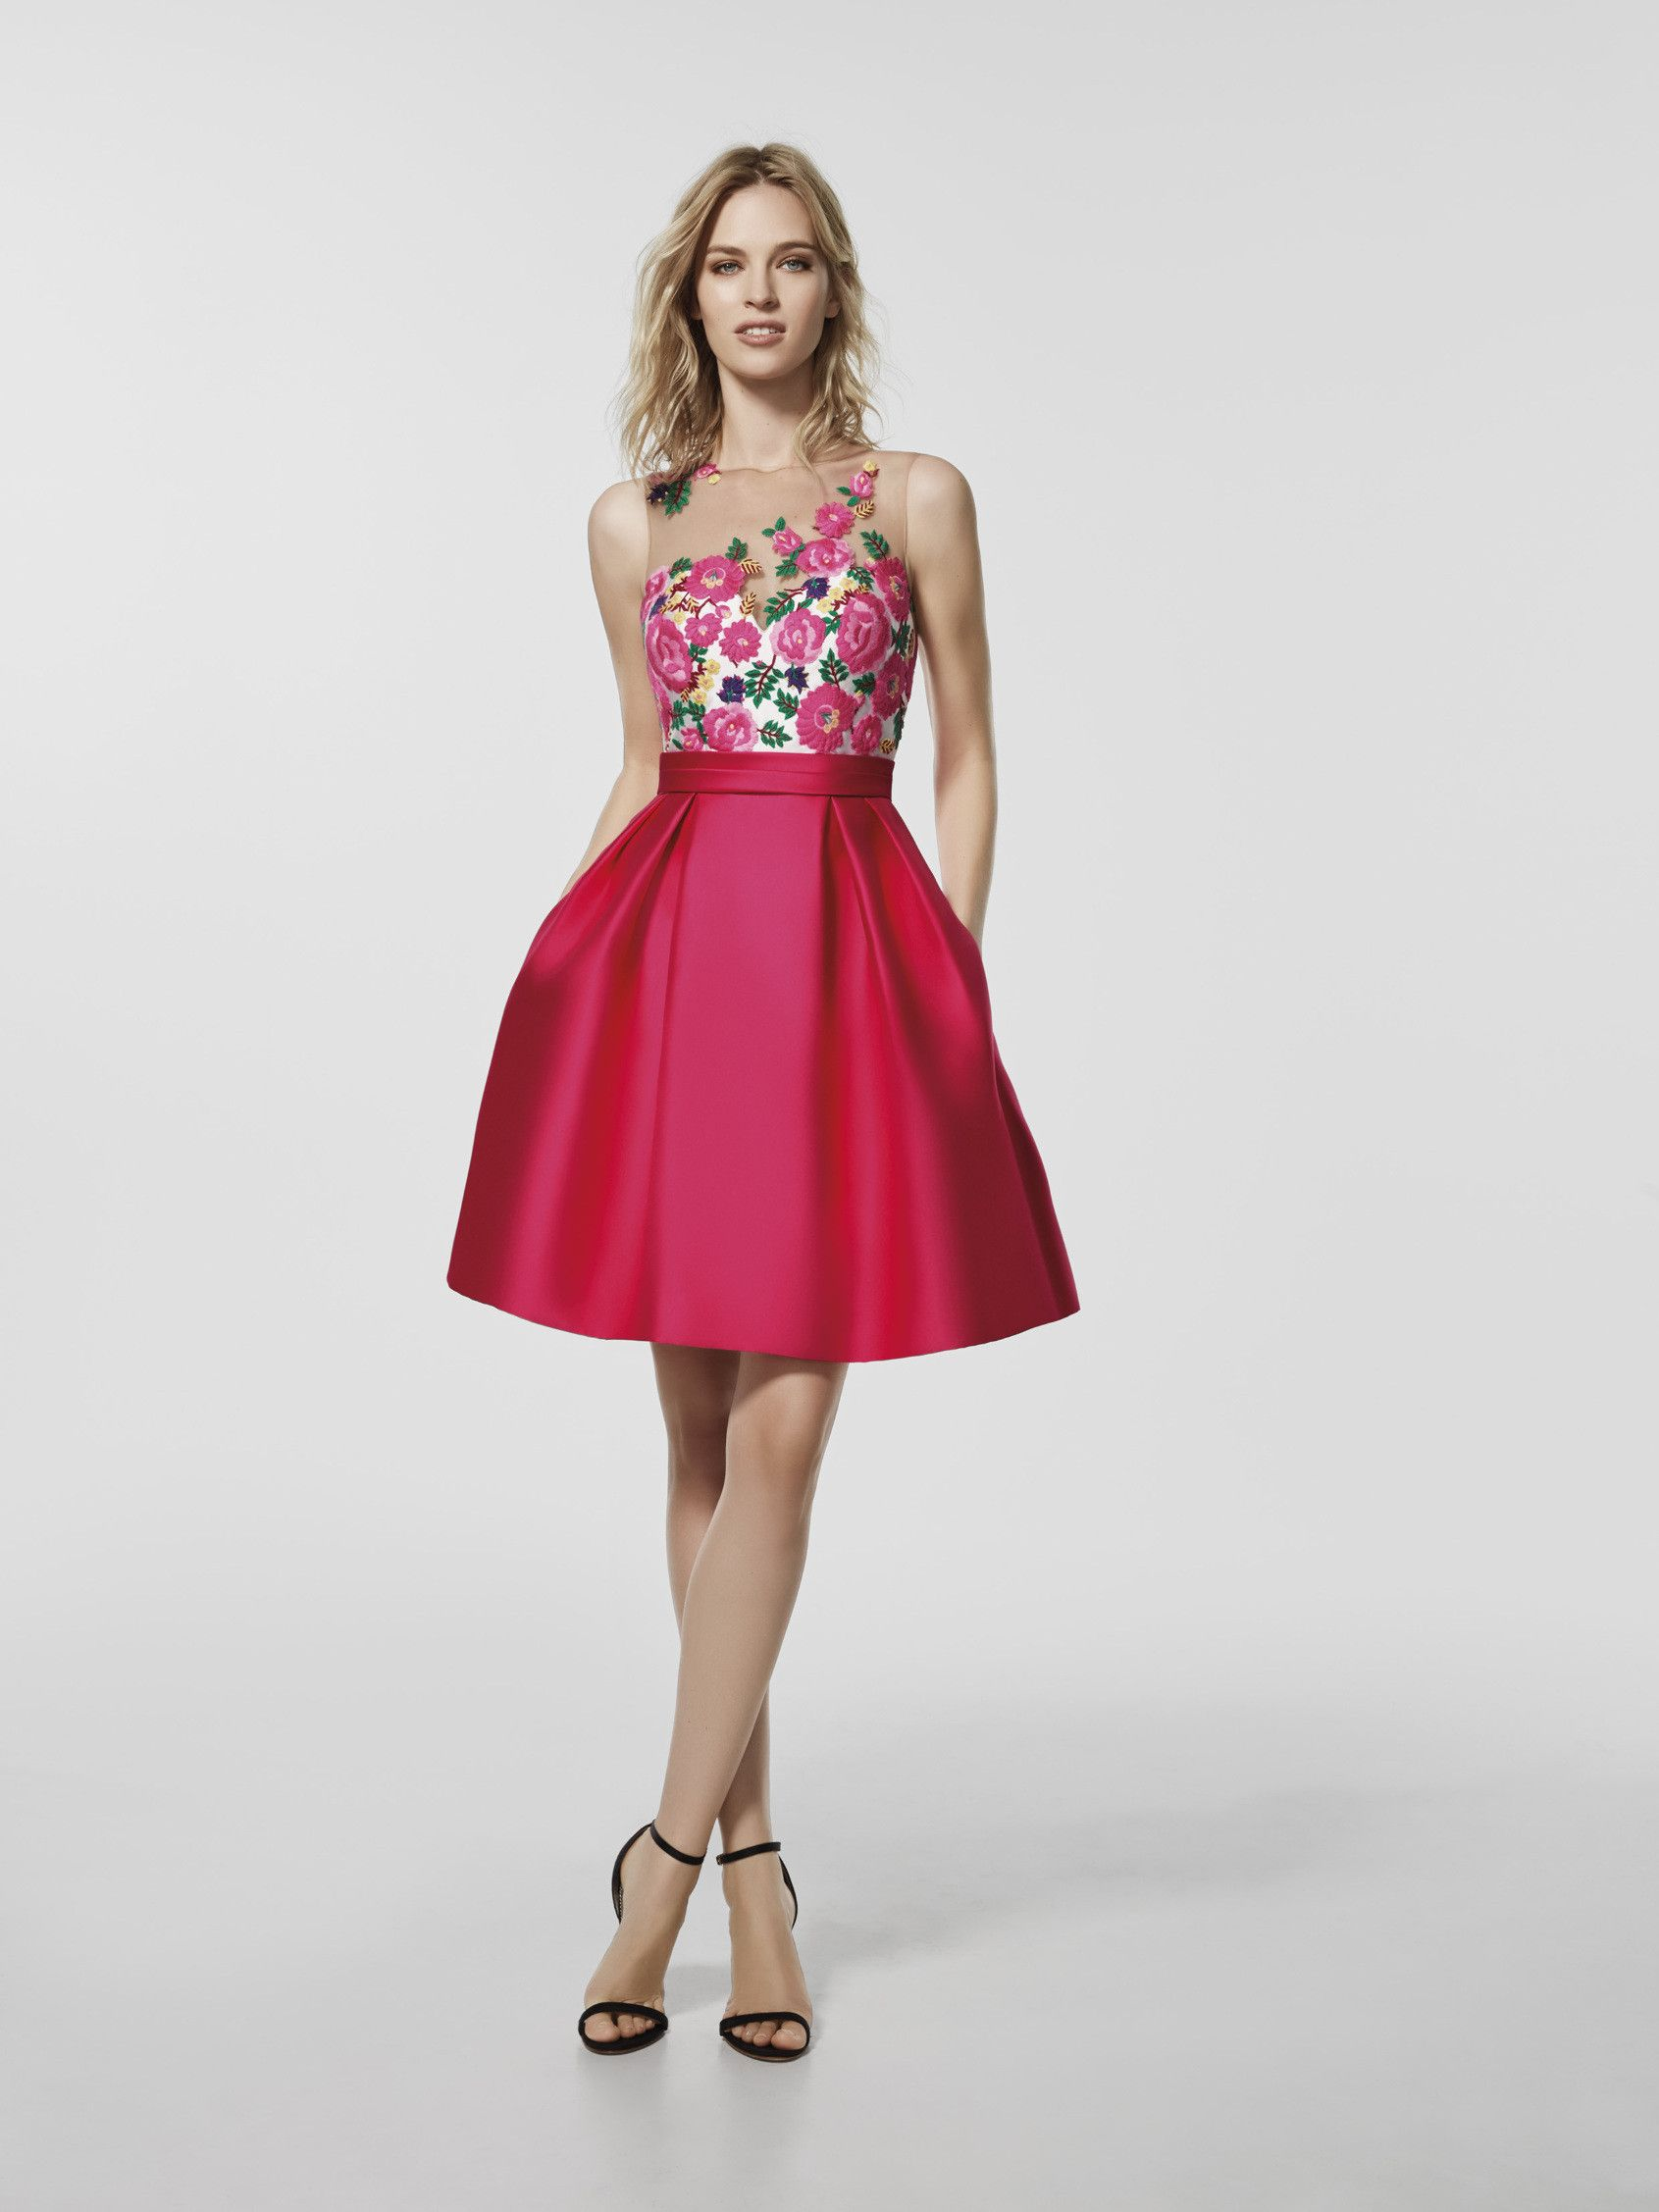 Foto vestido de fiesta rosa (62045) | moda | Pinterest | Kleidung